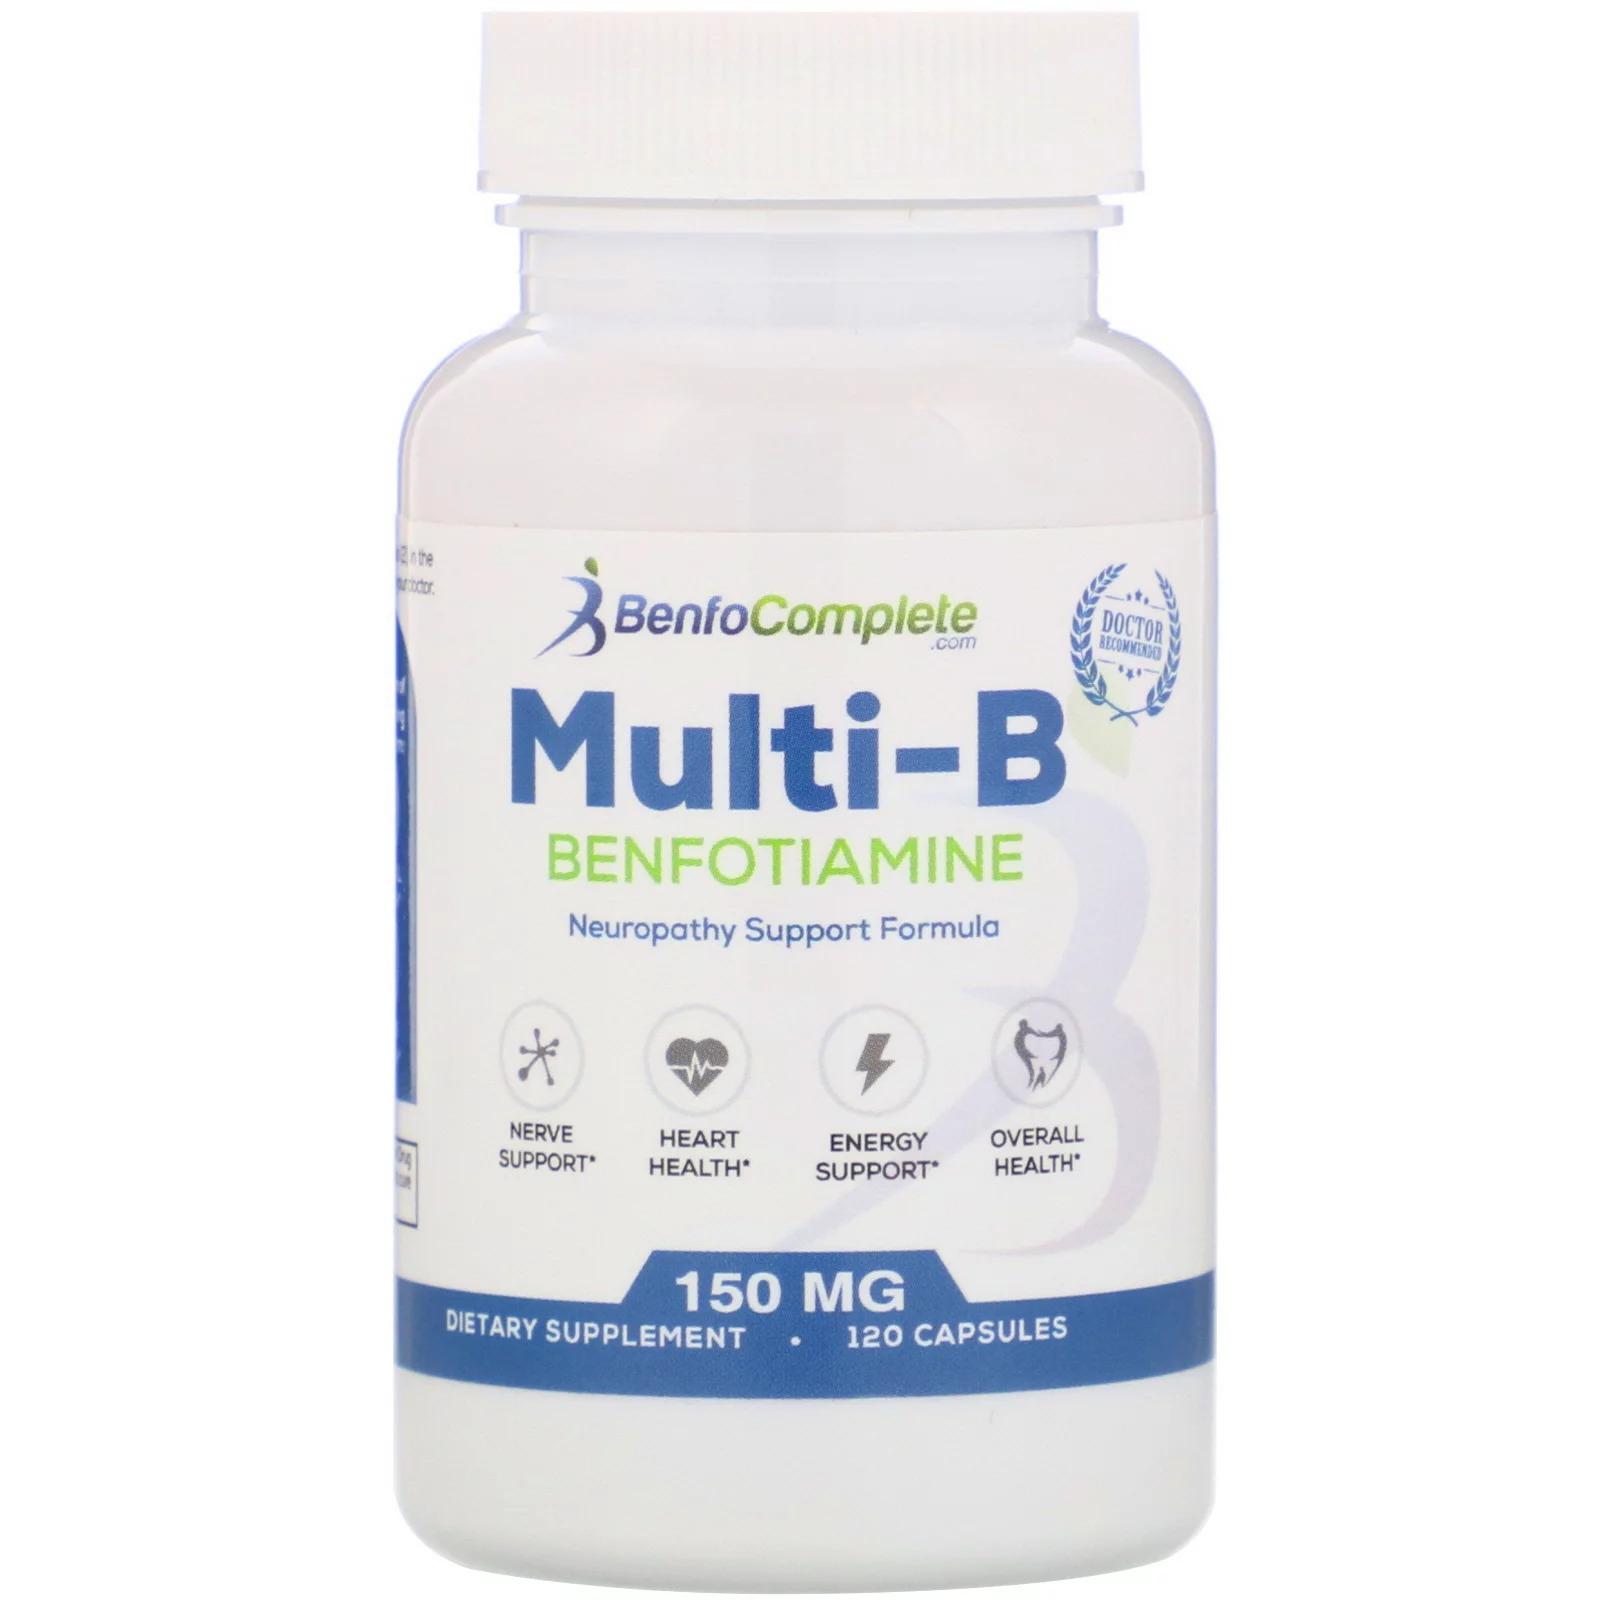 Benfotiamine Inc., Поддерживающая формула Multi-B при нейропатии, 150 мг, 120 капсул